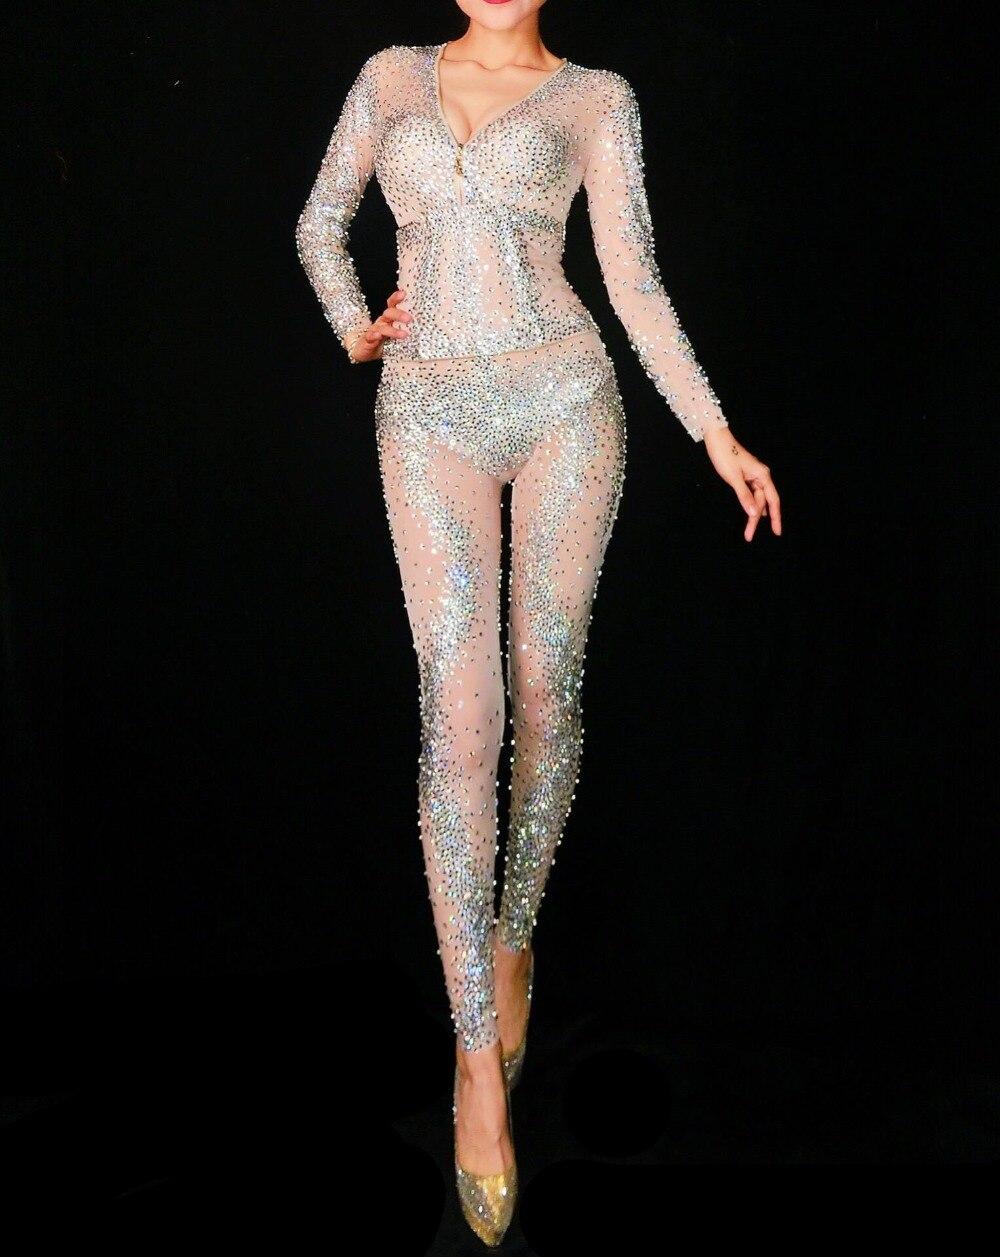 Femmes Bal D'anniversaire Costume Scintillant Bar Fête Dance De Strass 2 Salopette Performance Tenue 1 Wear Discothèque Play 3 Body Sexy Ar67Anxv